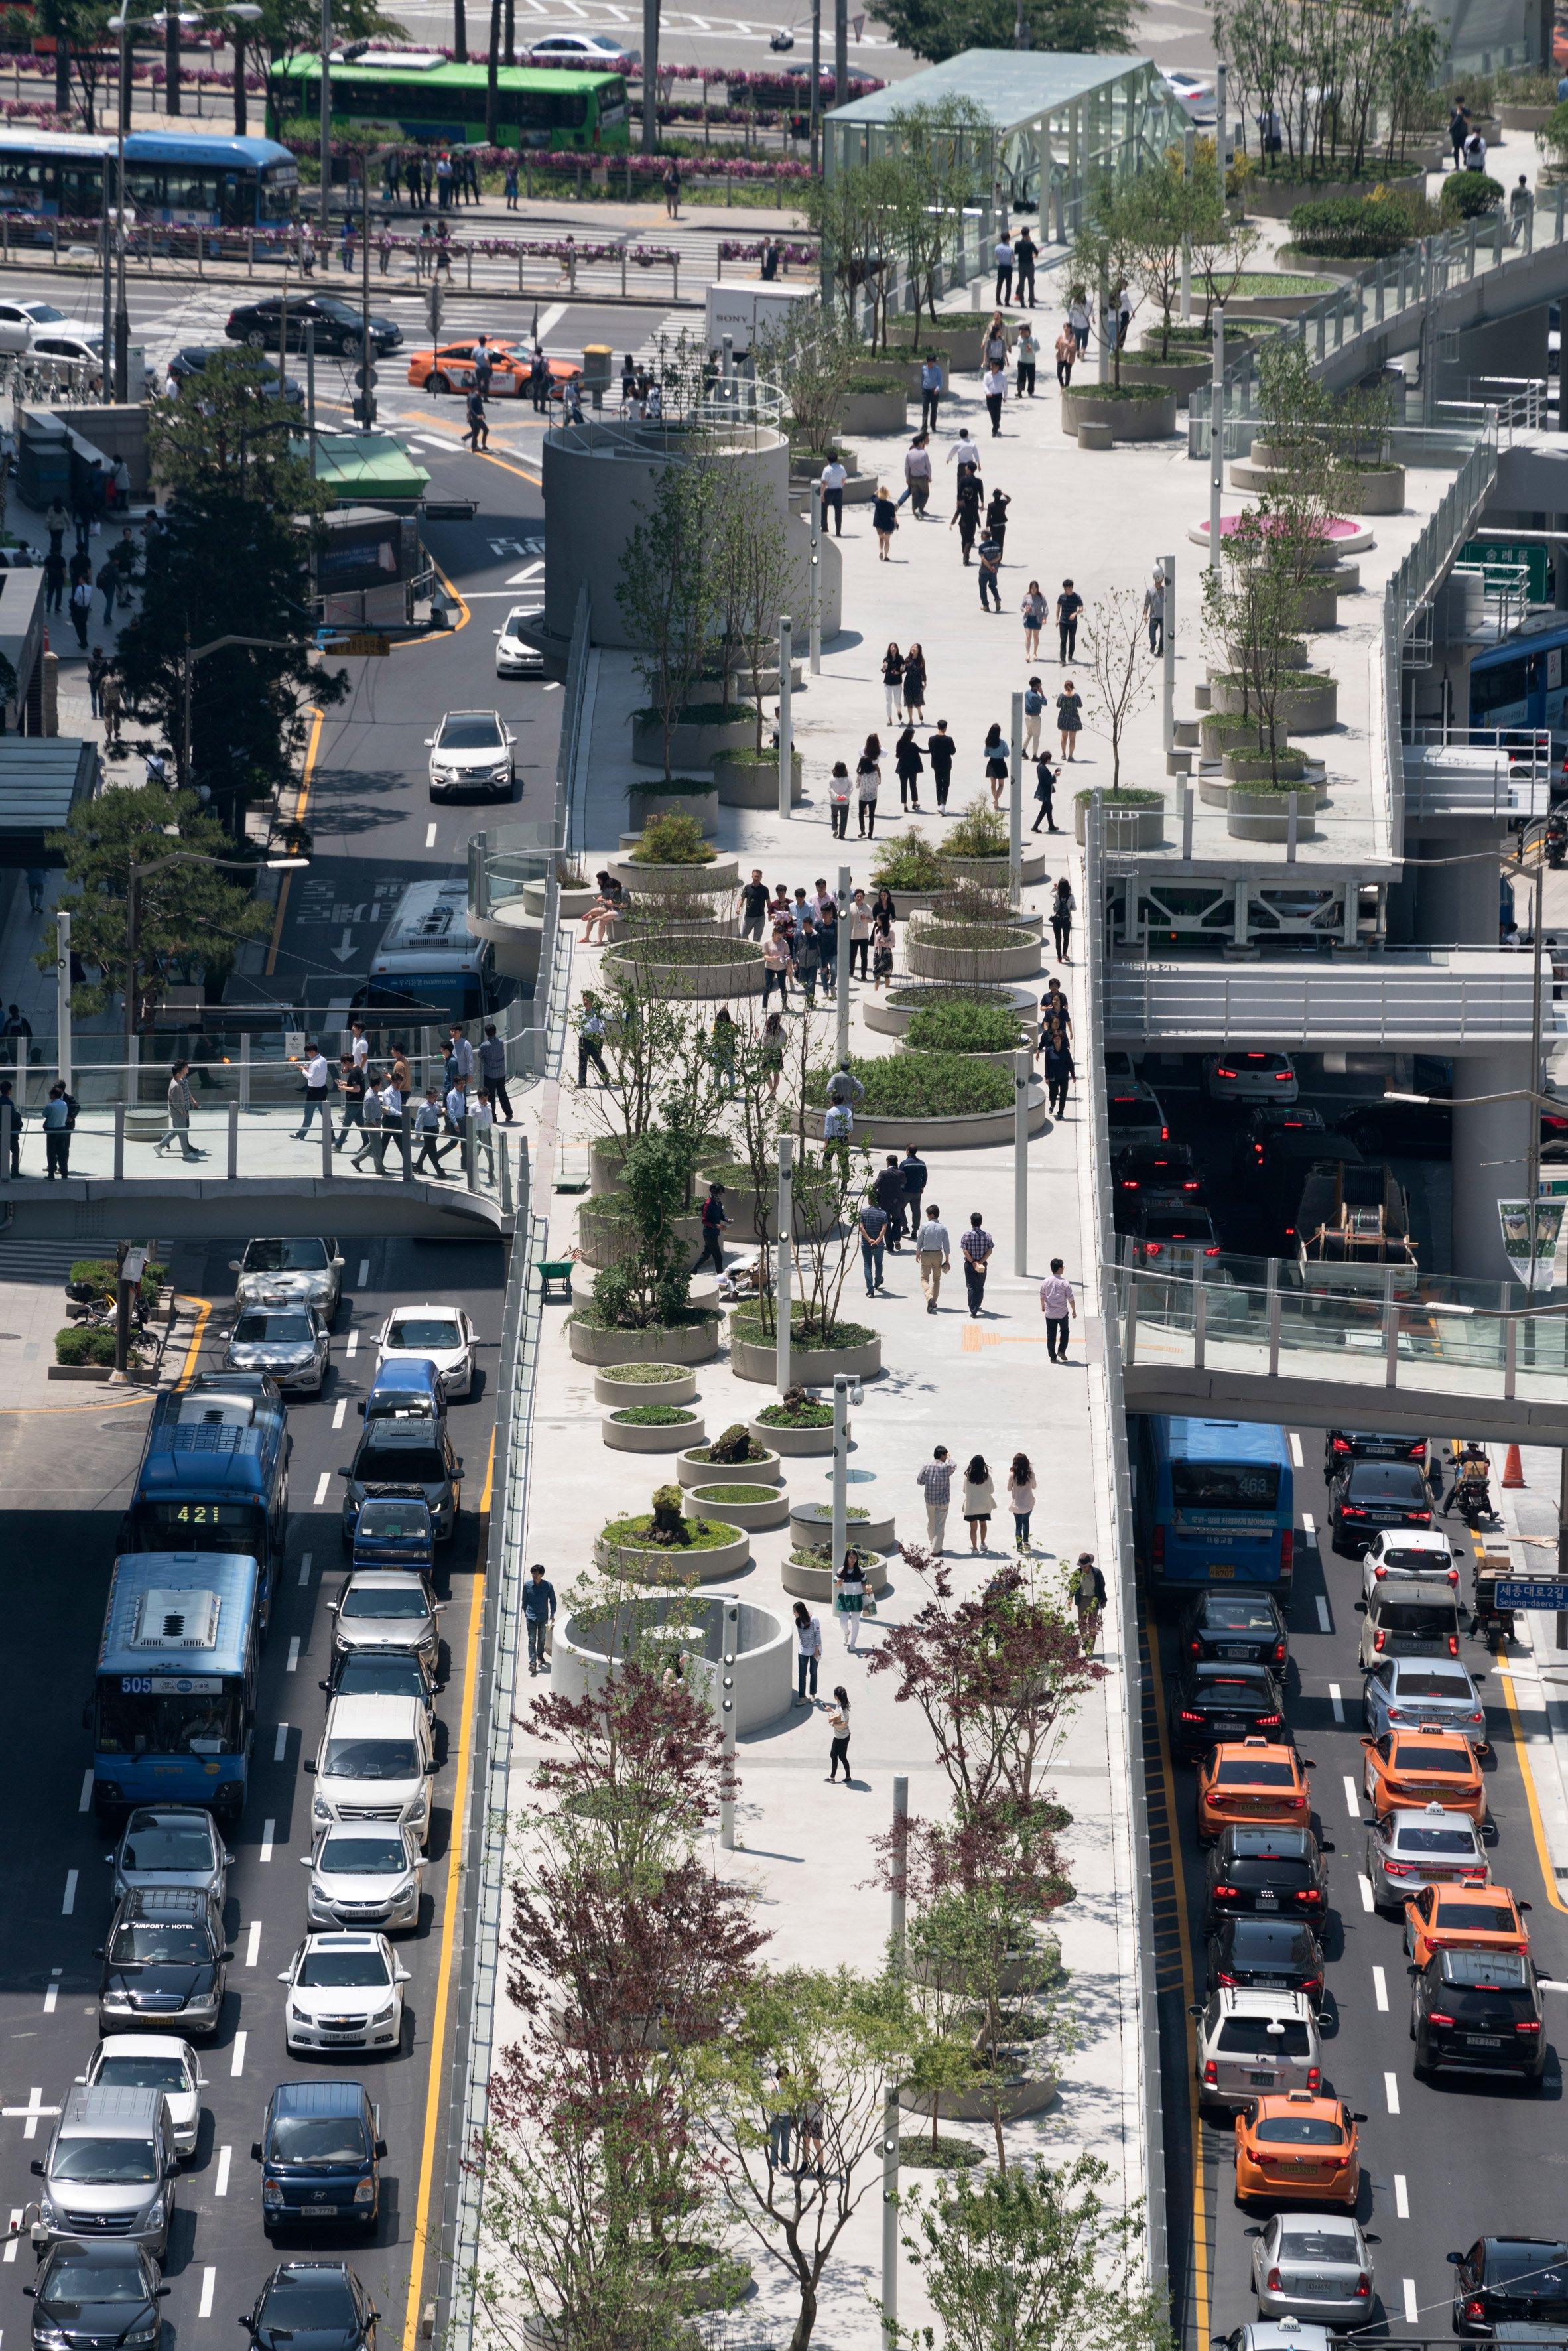 skygarden-mvrdv-architecture-landscape-urbanism-seoul-south-korea-_dezeen_2364_col_5.jpg